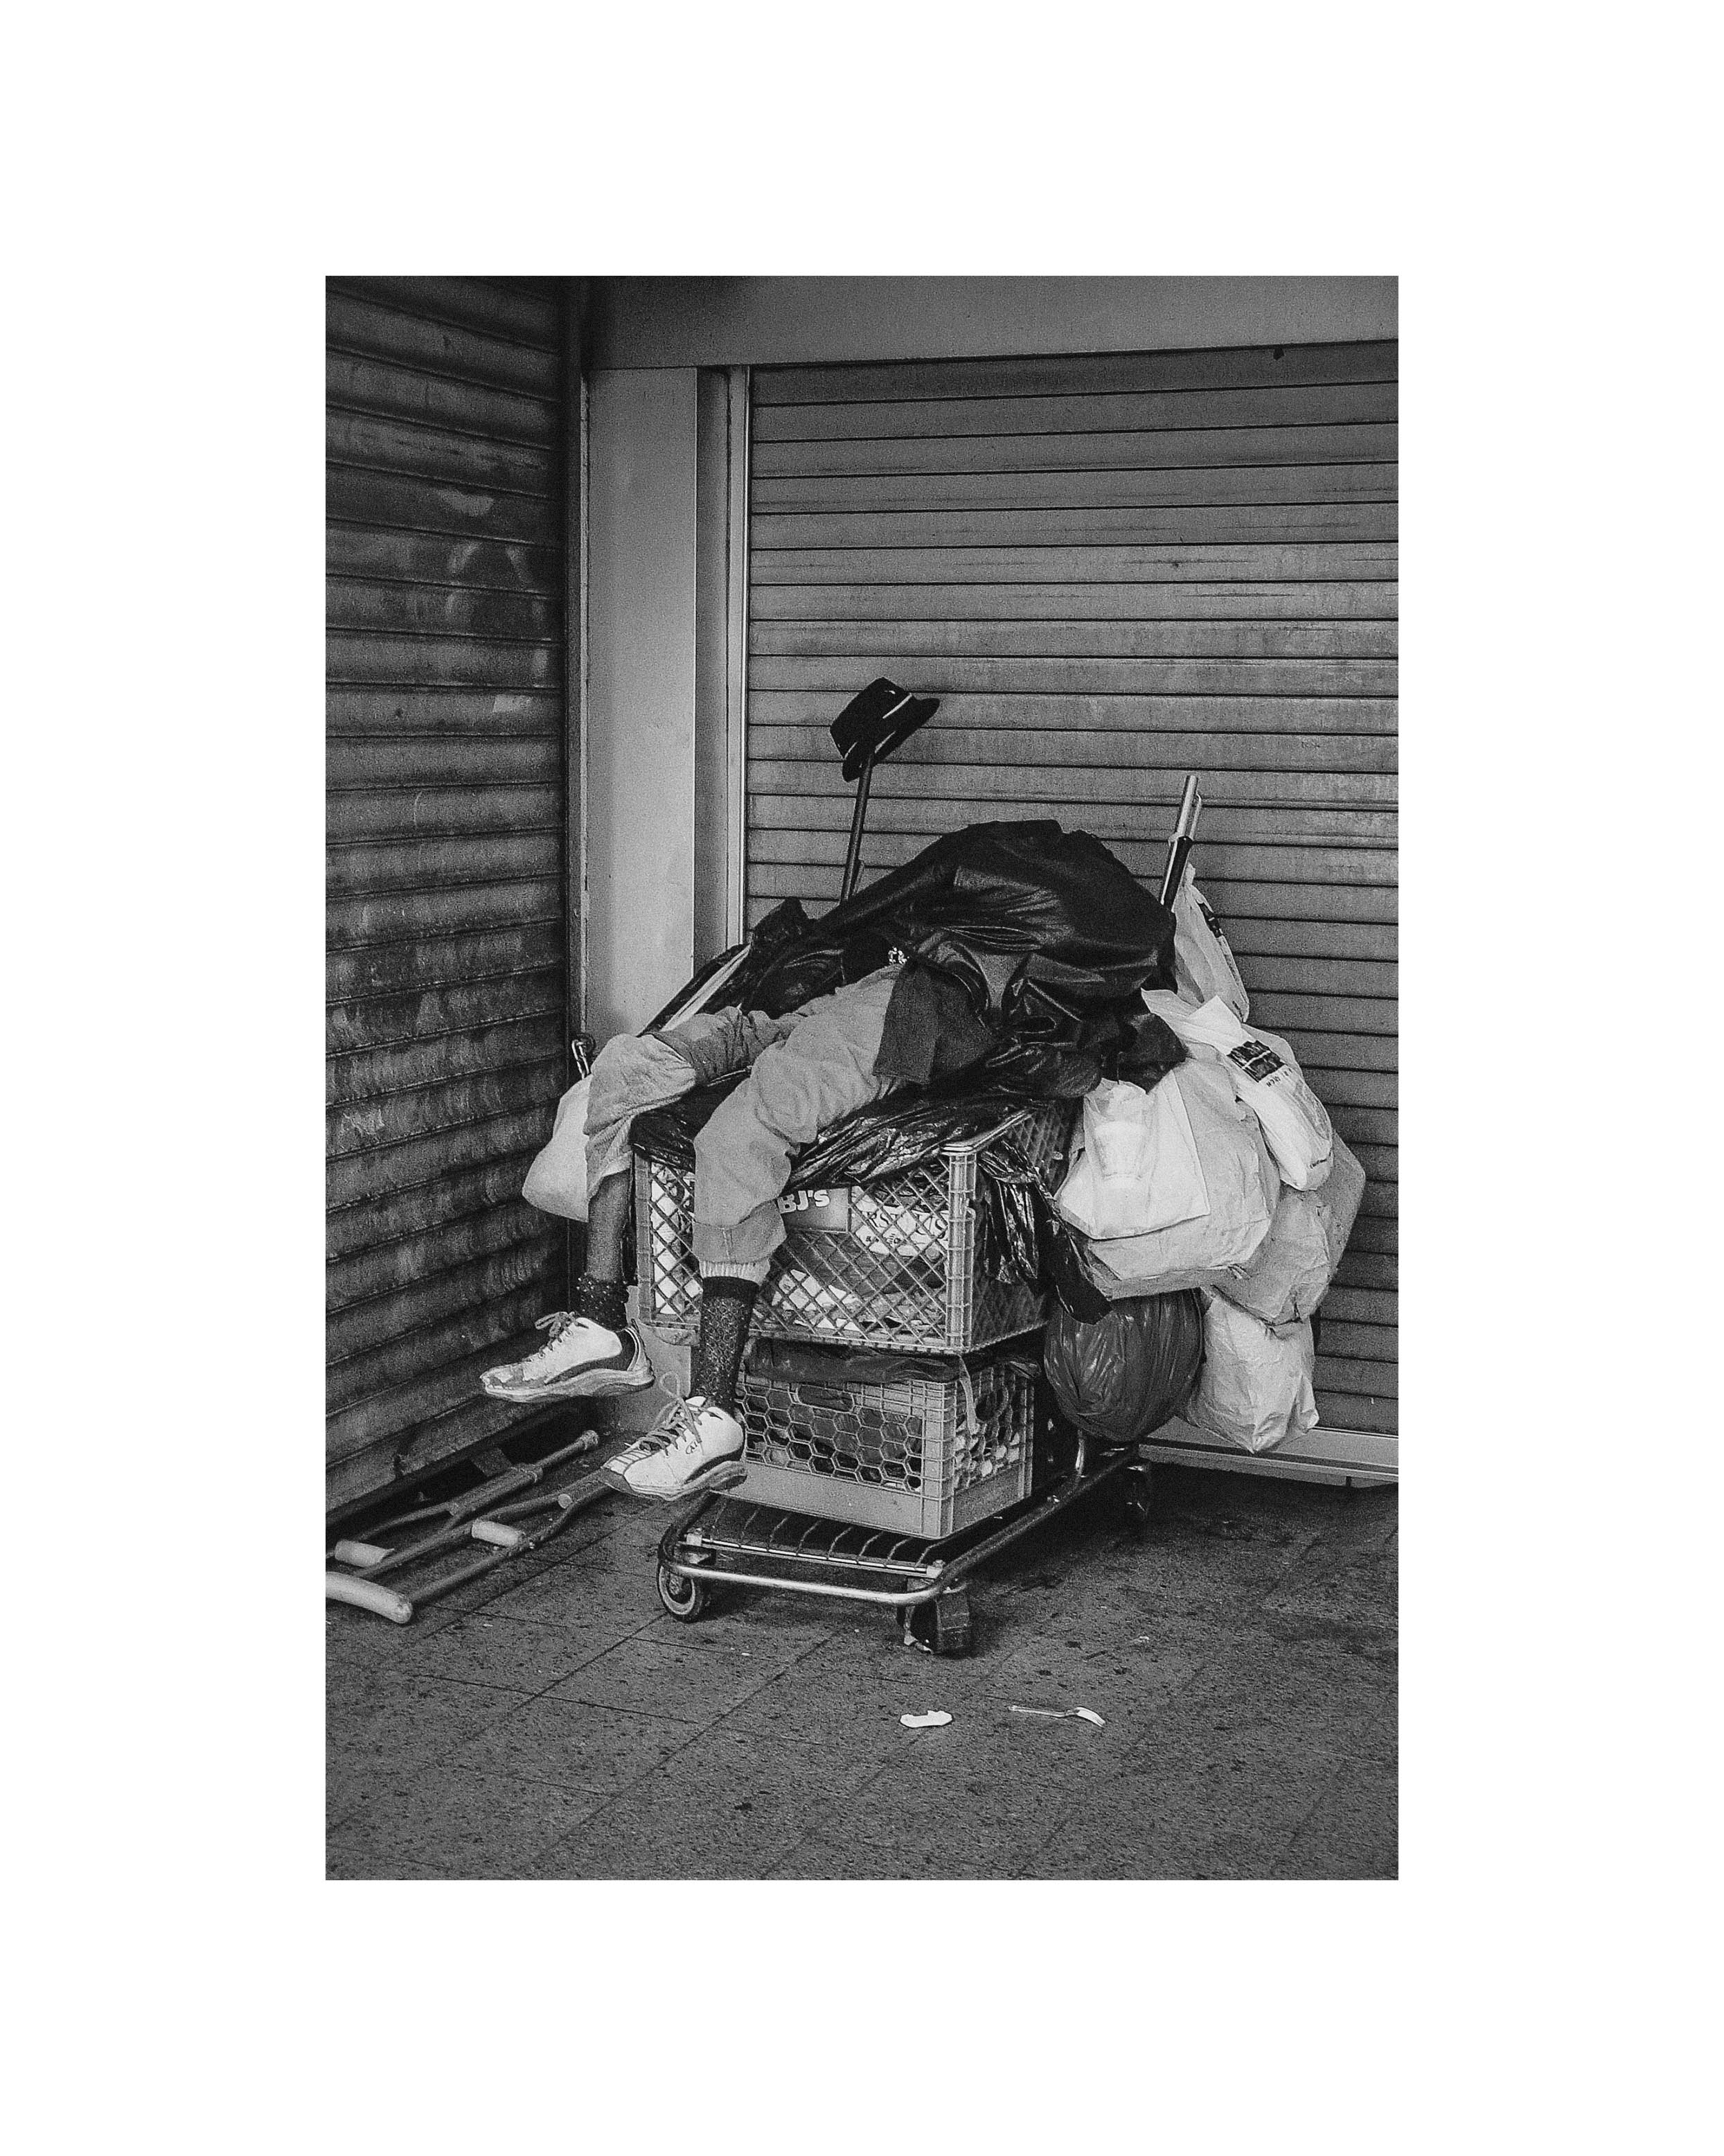 shane_deruise_alleyways_man_sleeping_on_cart.jpg